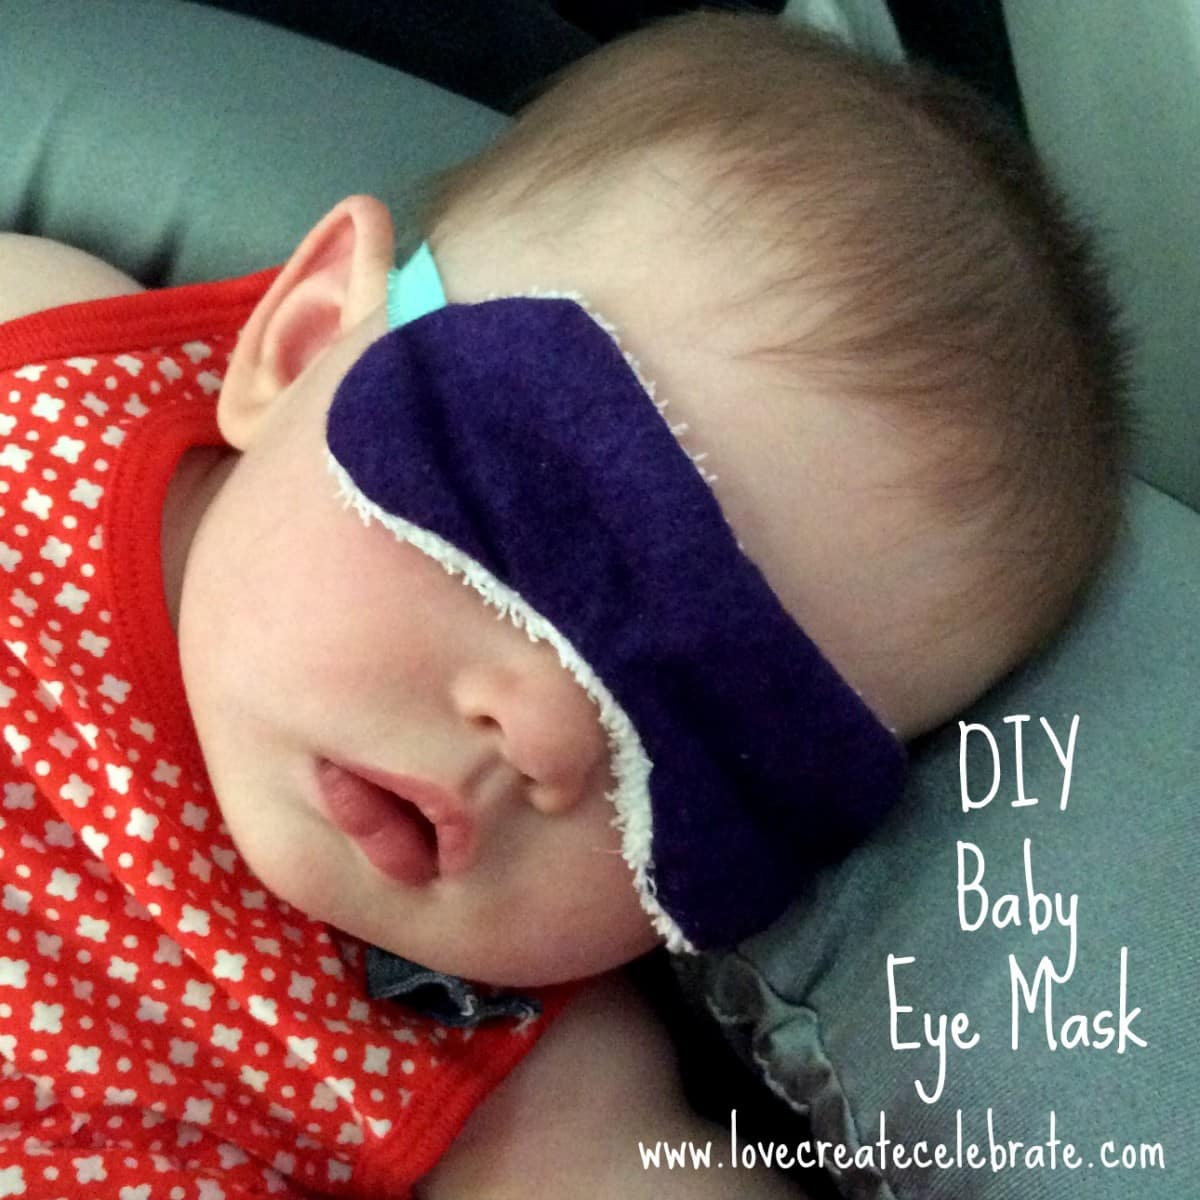 Diy Sleep Mask For Your Baby Love Create Celebrate